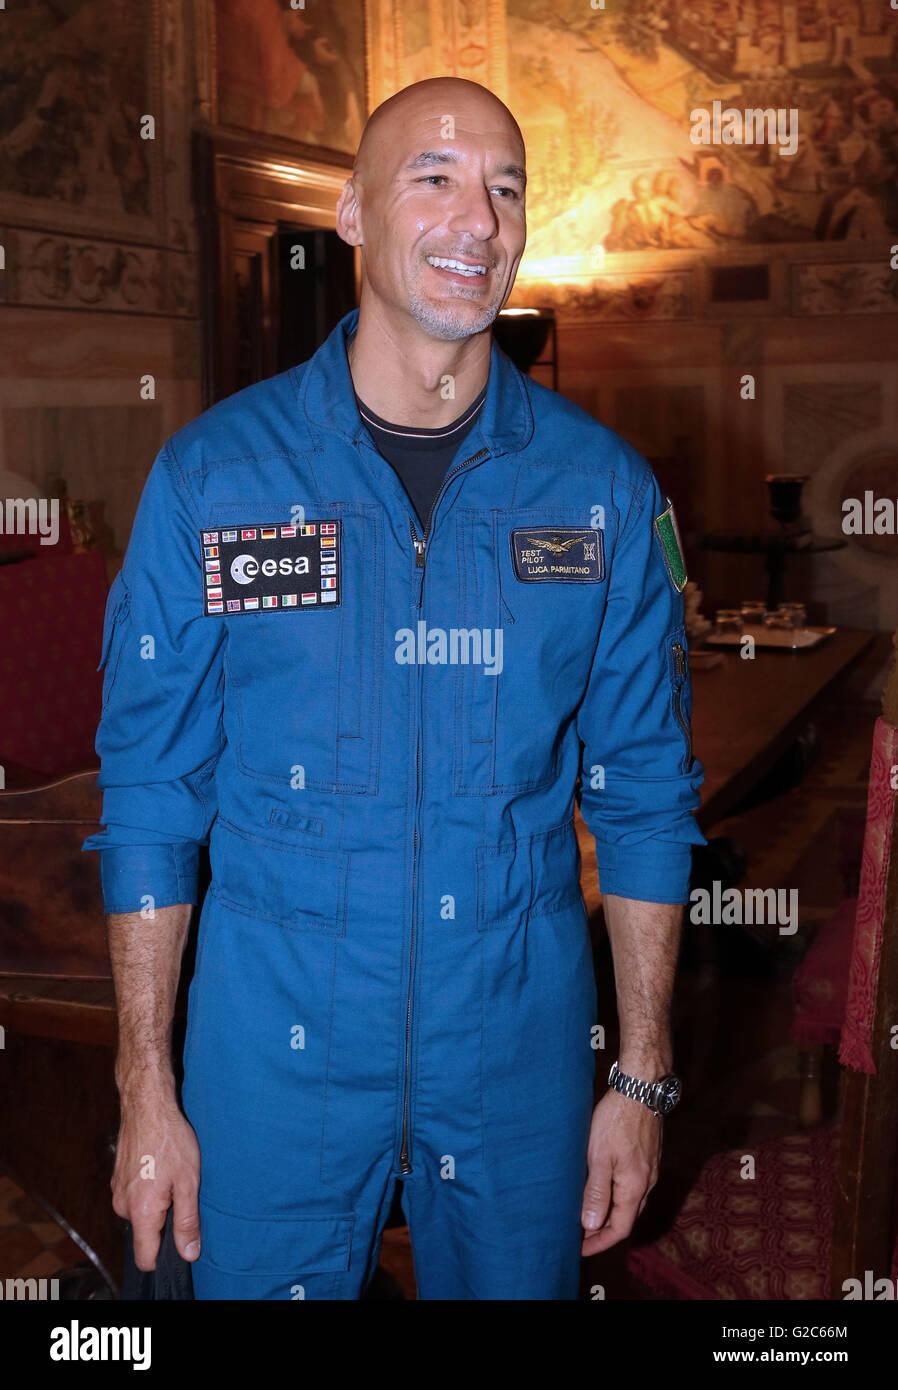 LUCA PARMITANO,Astronaut European Space Agency ( ESA ) - Stock Image